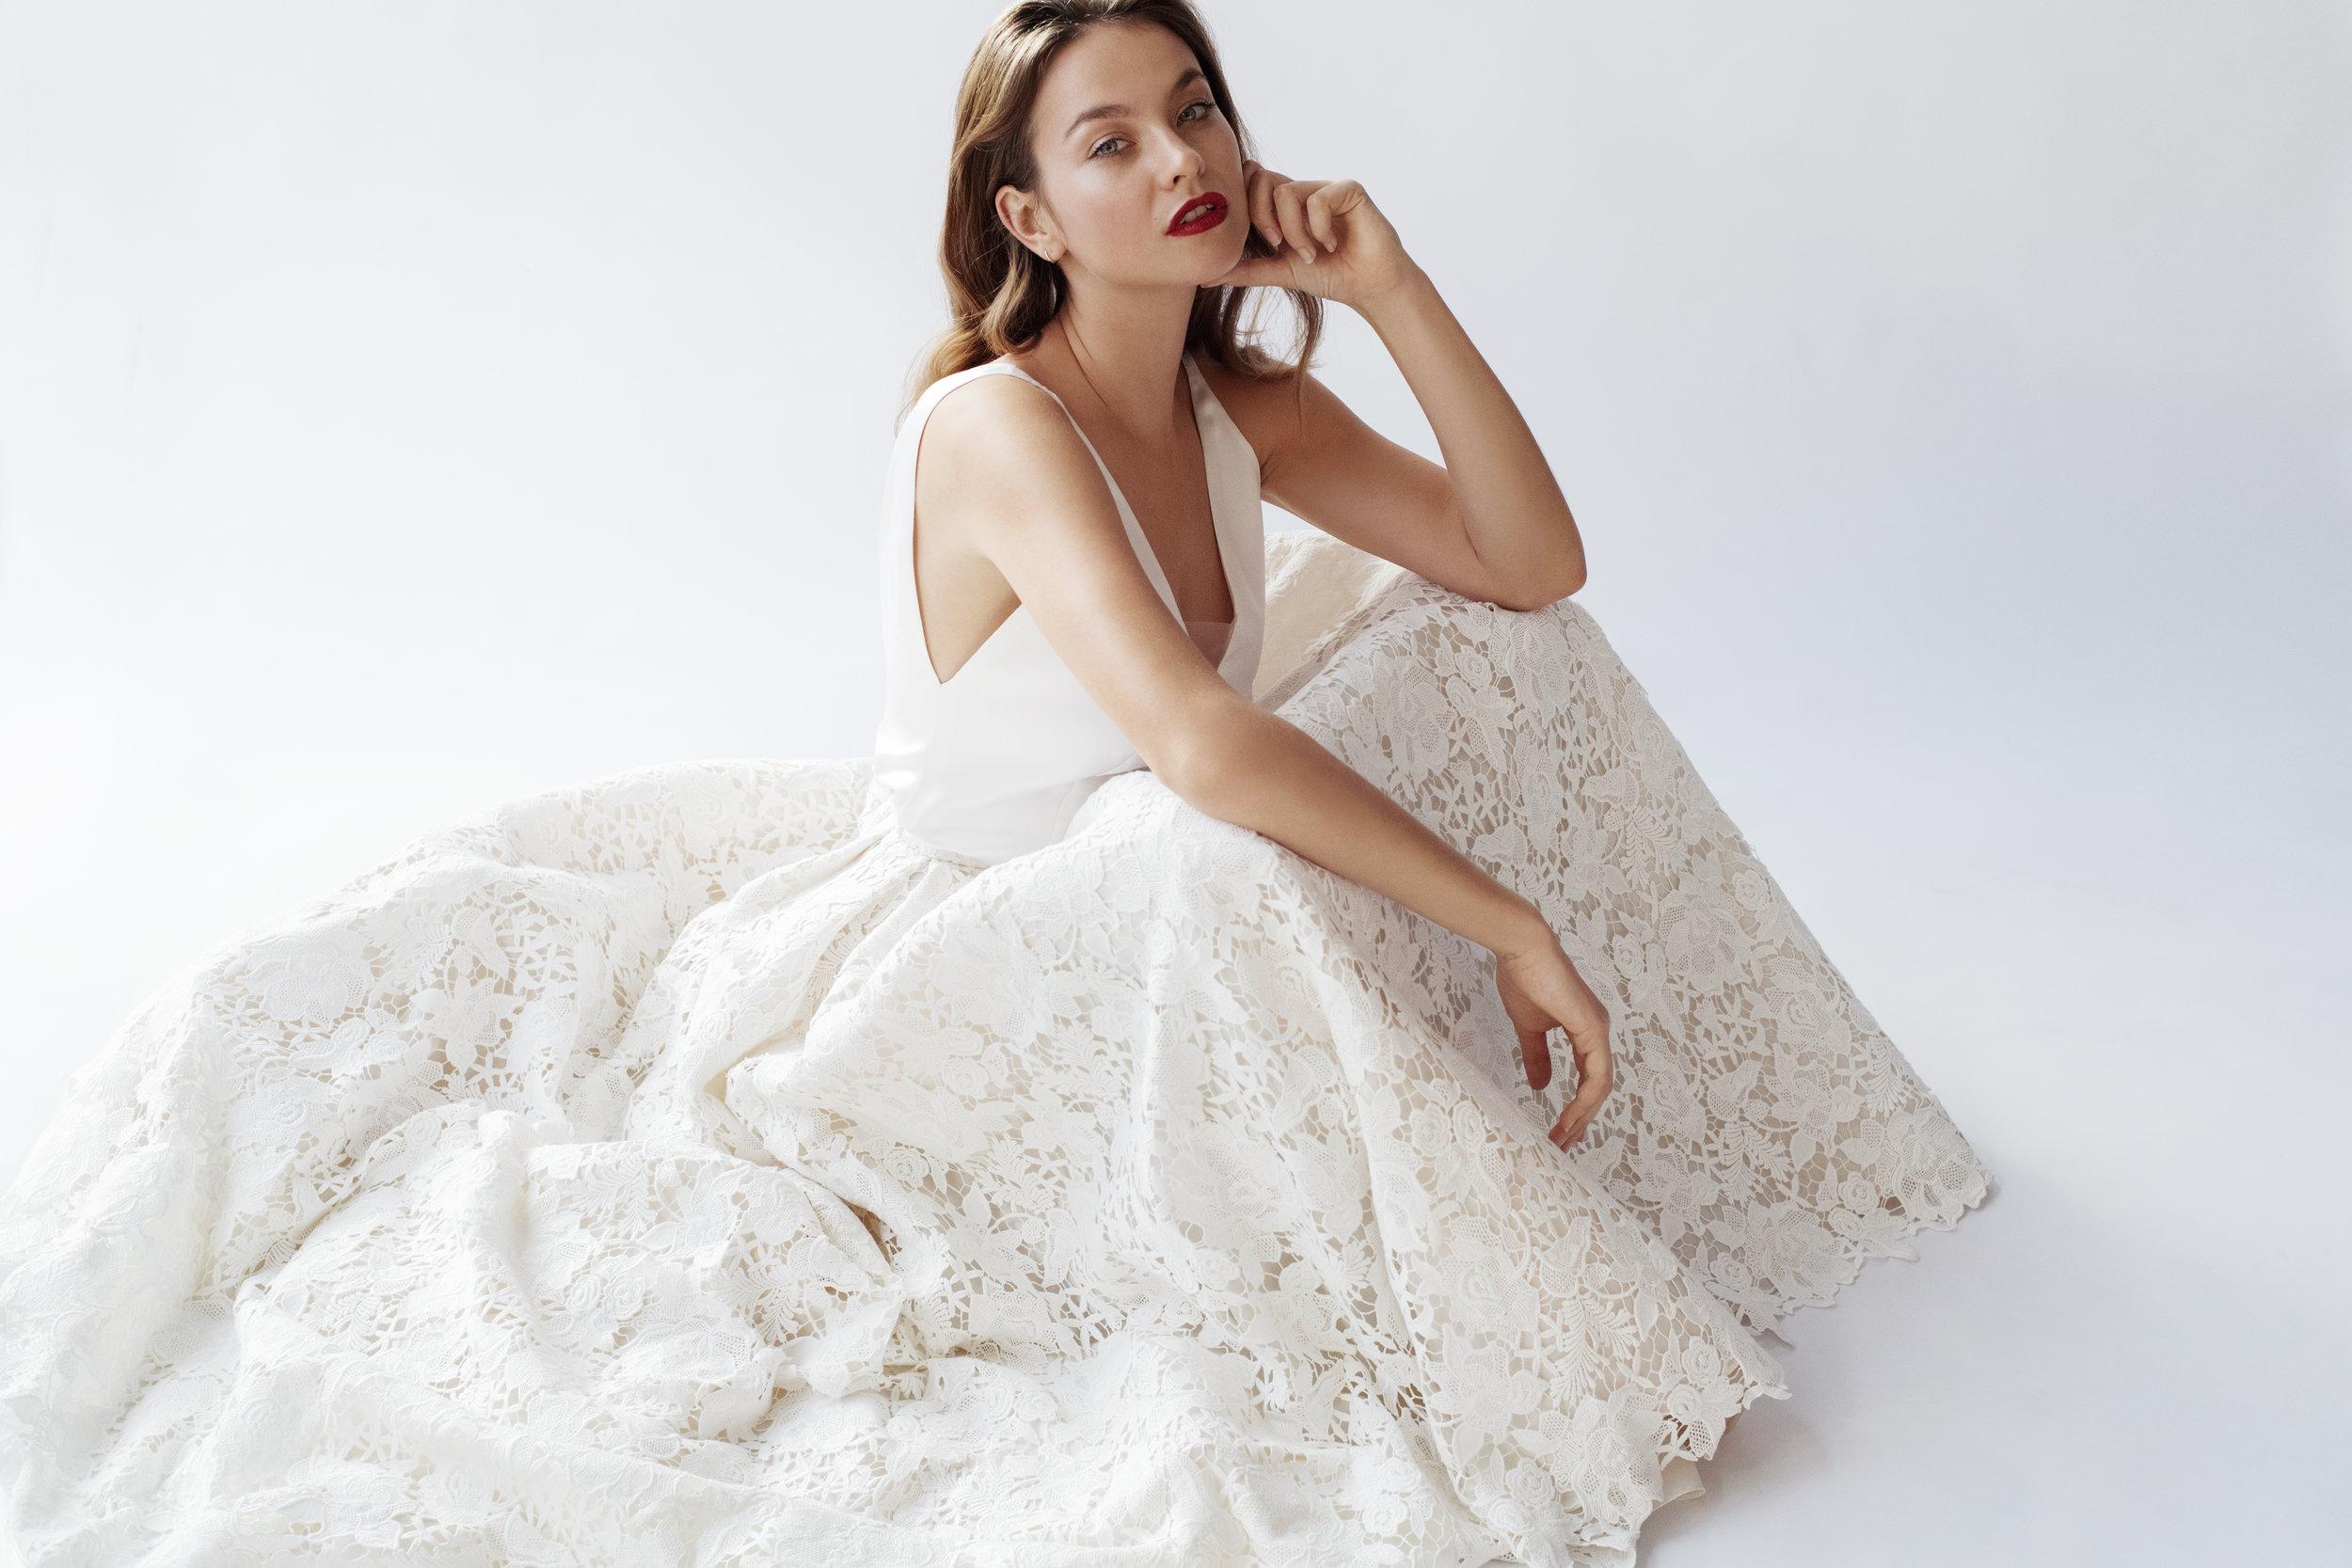 maatkleding-bruidskleding-bridal-bruidsjurk-gent-janssens-fabrics-tailoring-bruidscollectie-aimee-Nina02.jpg